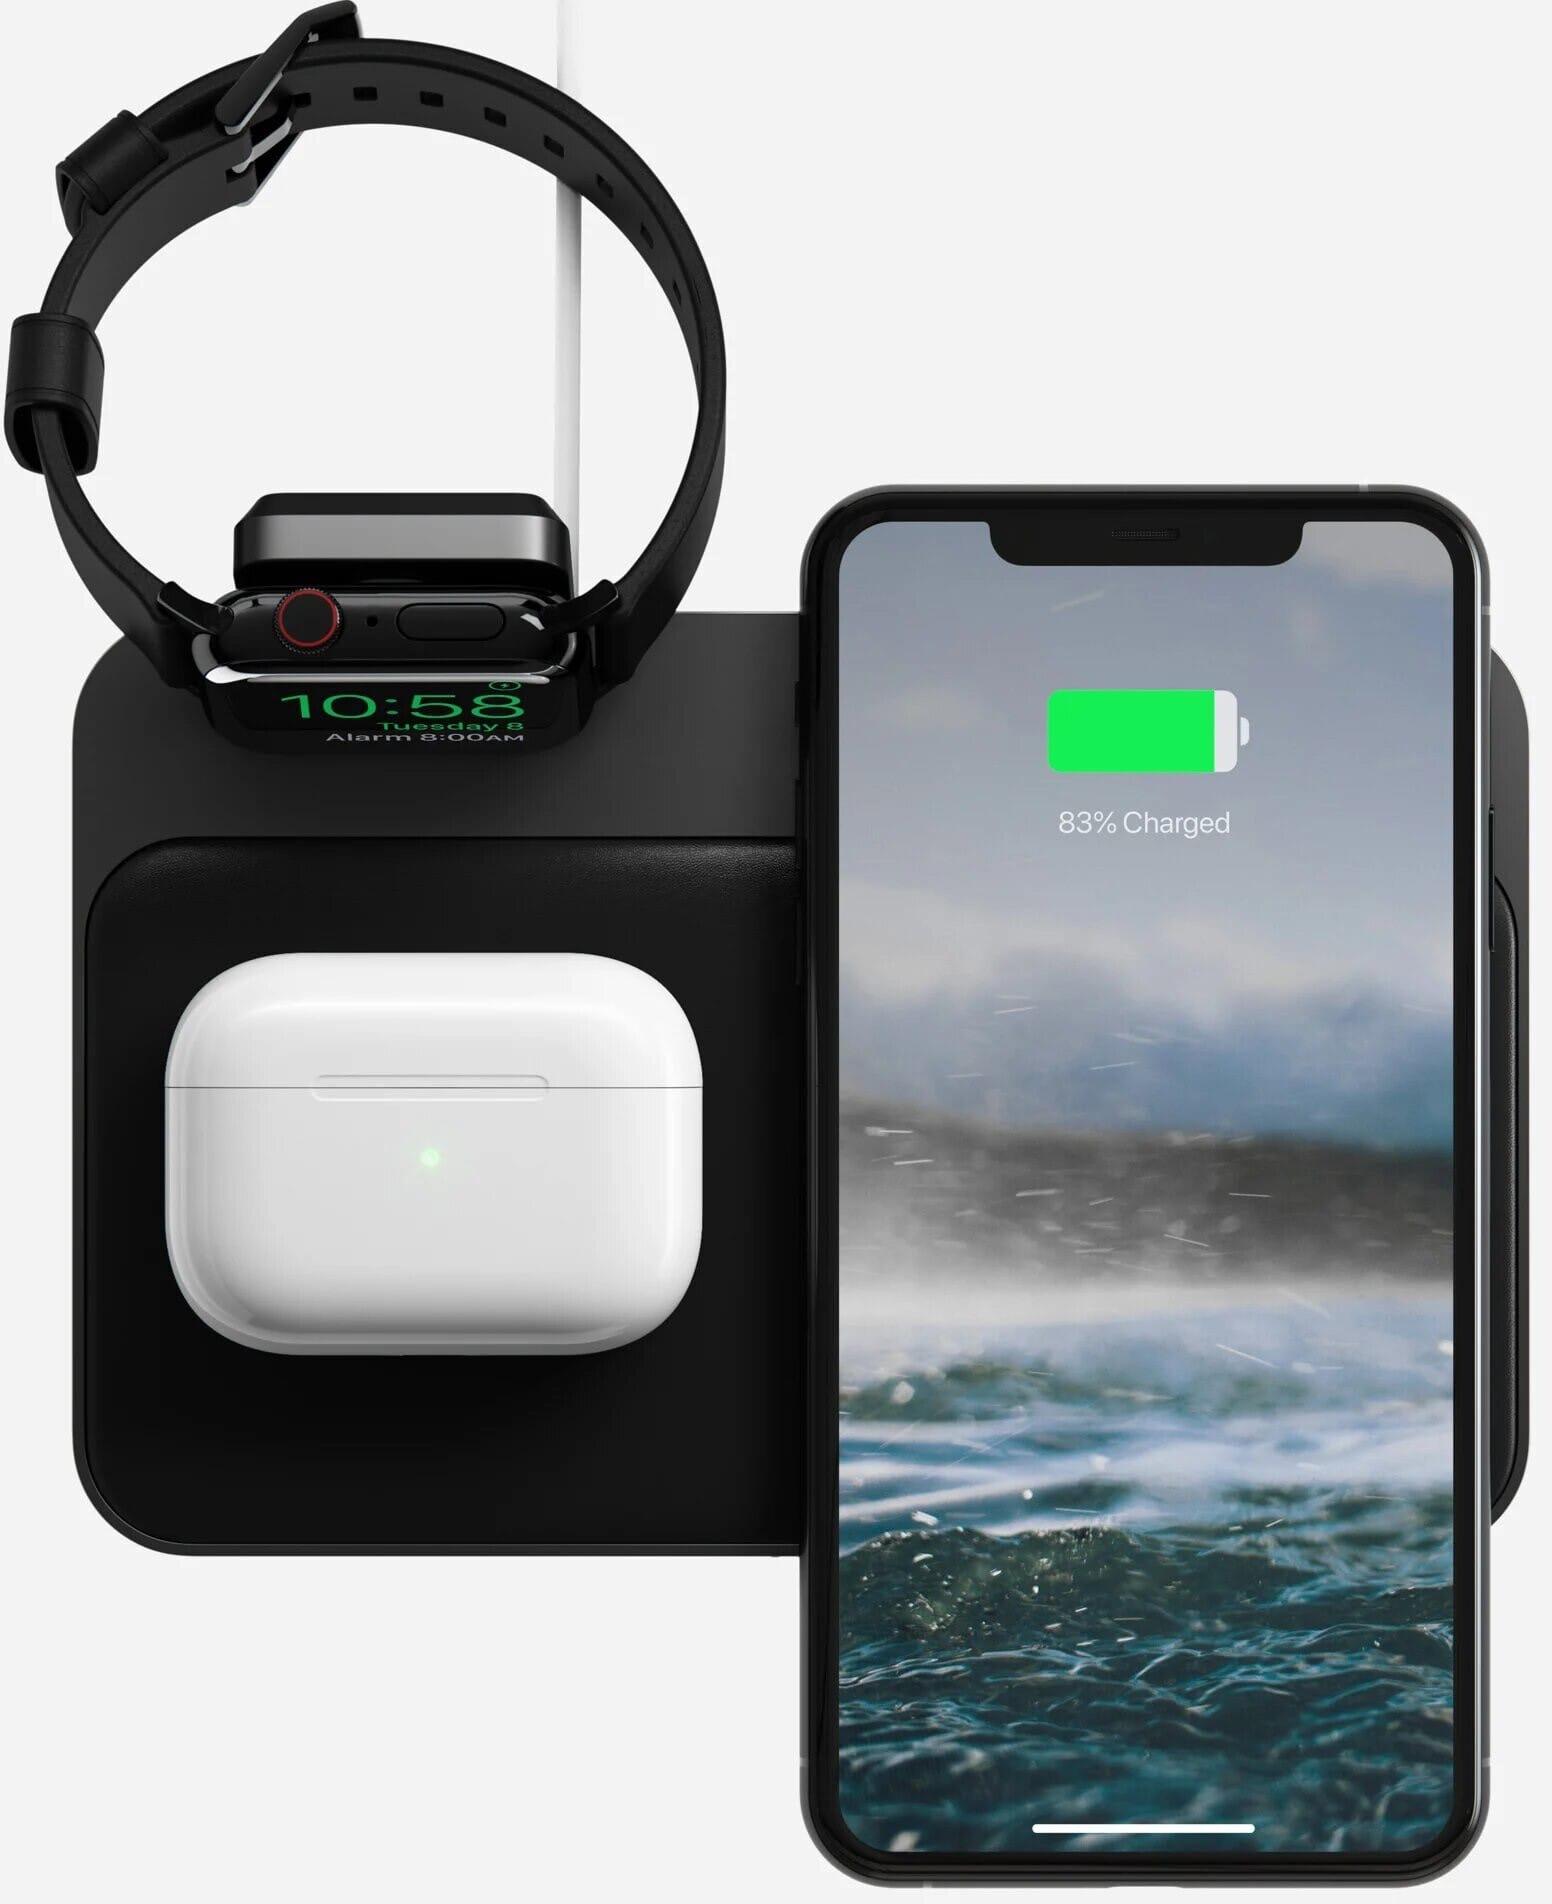 Nomad Base Station - Apple Watch Mount Edition